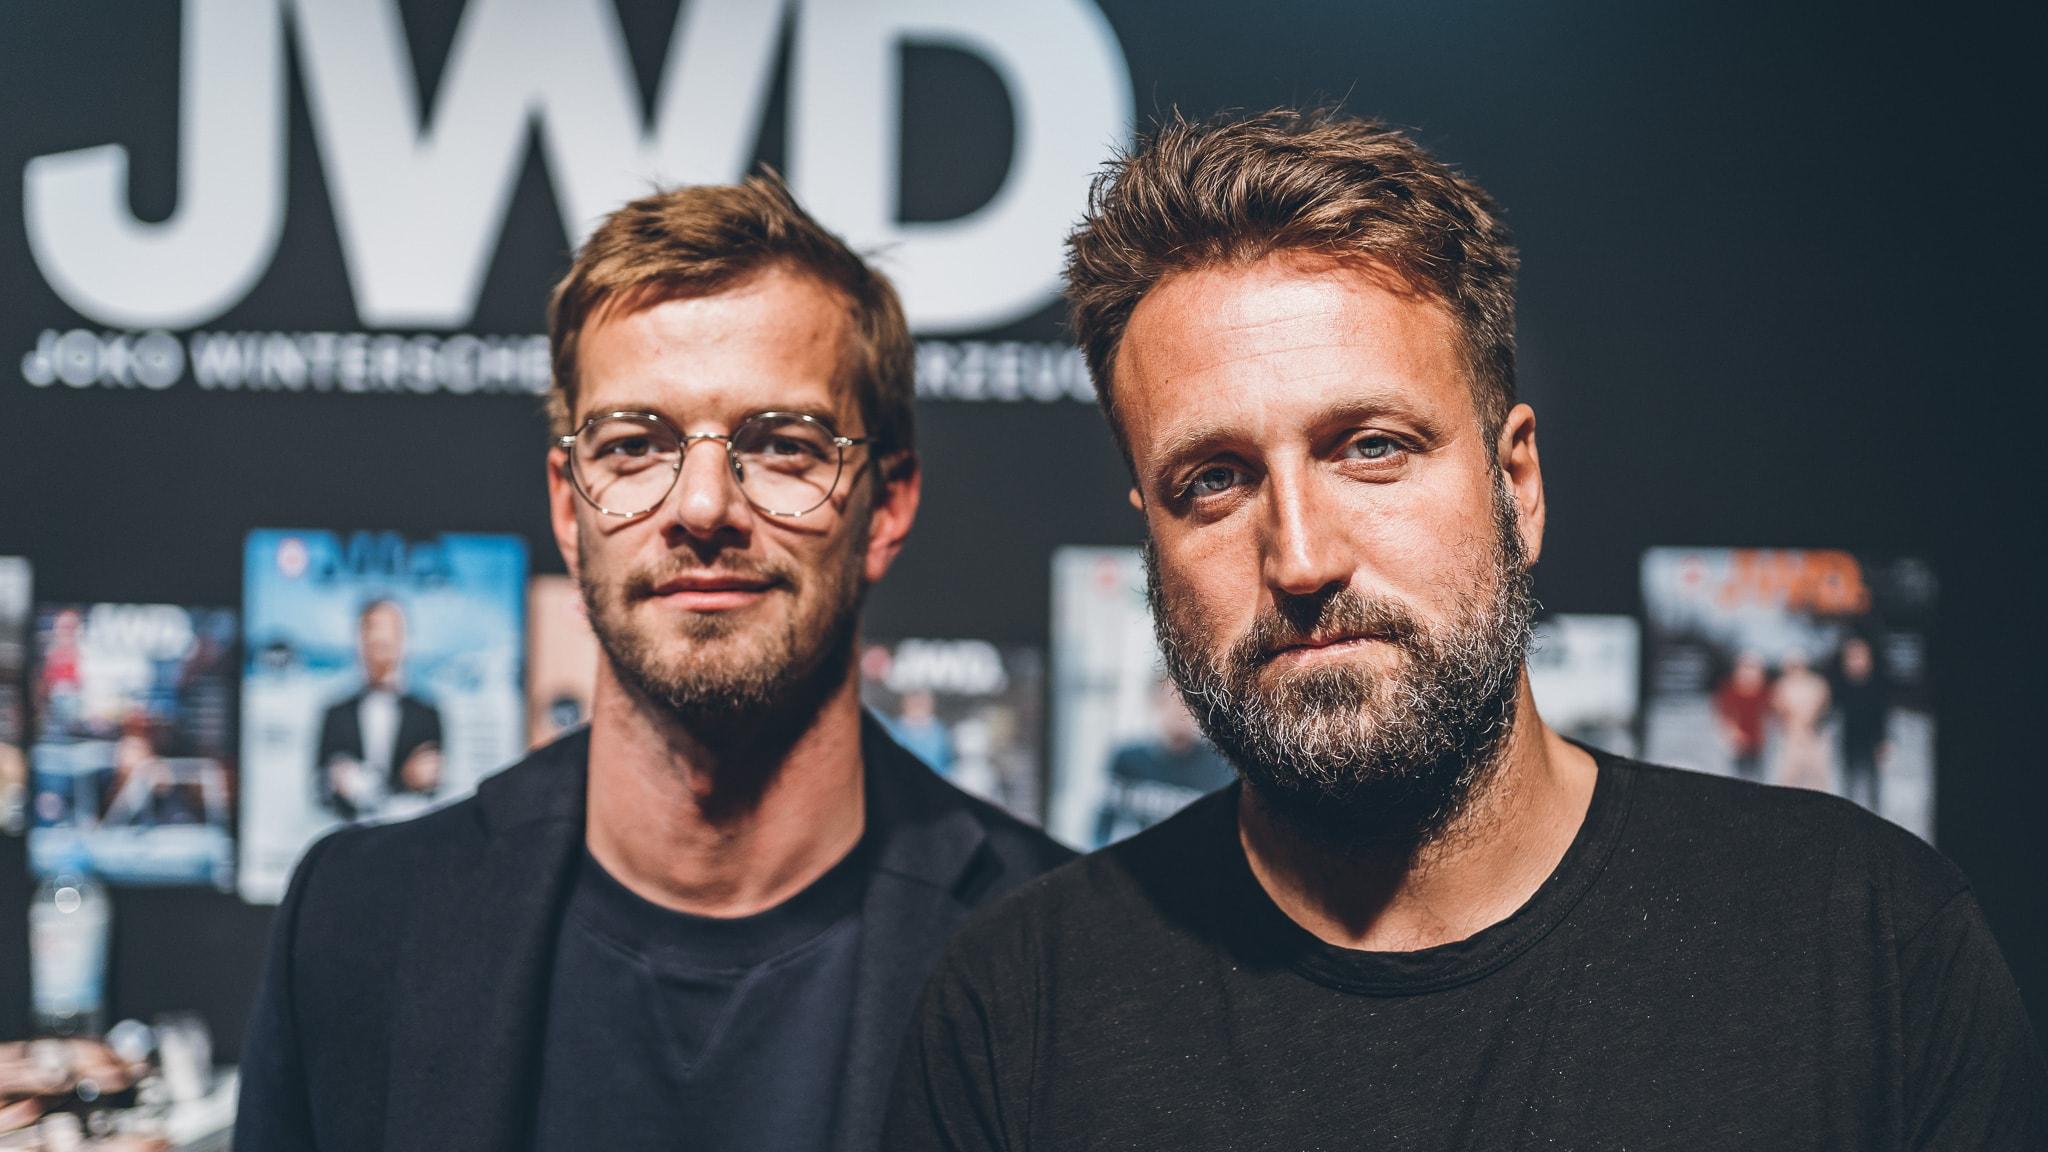 Joko Winterscheid & Paul Ripke @ OMR19